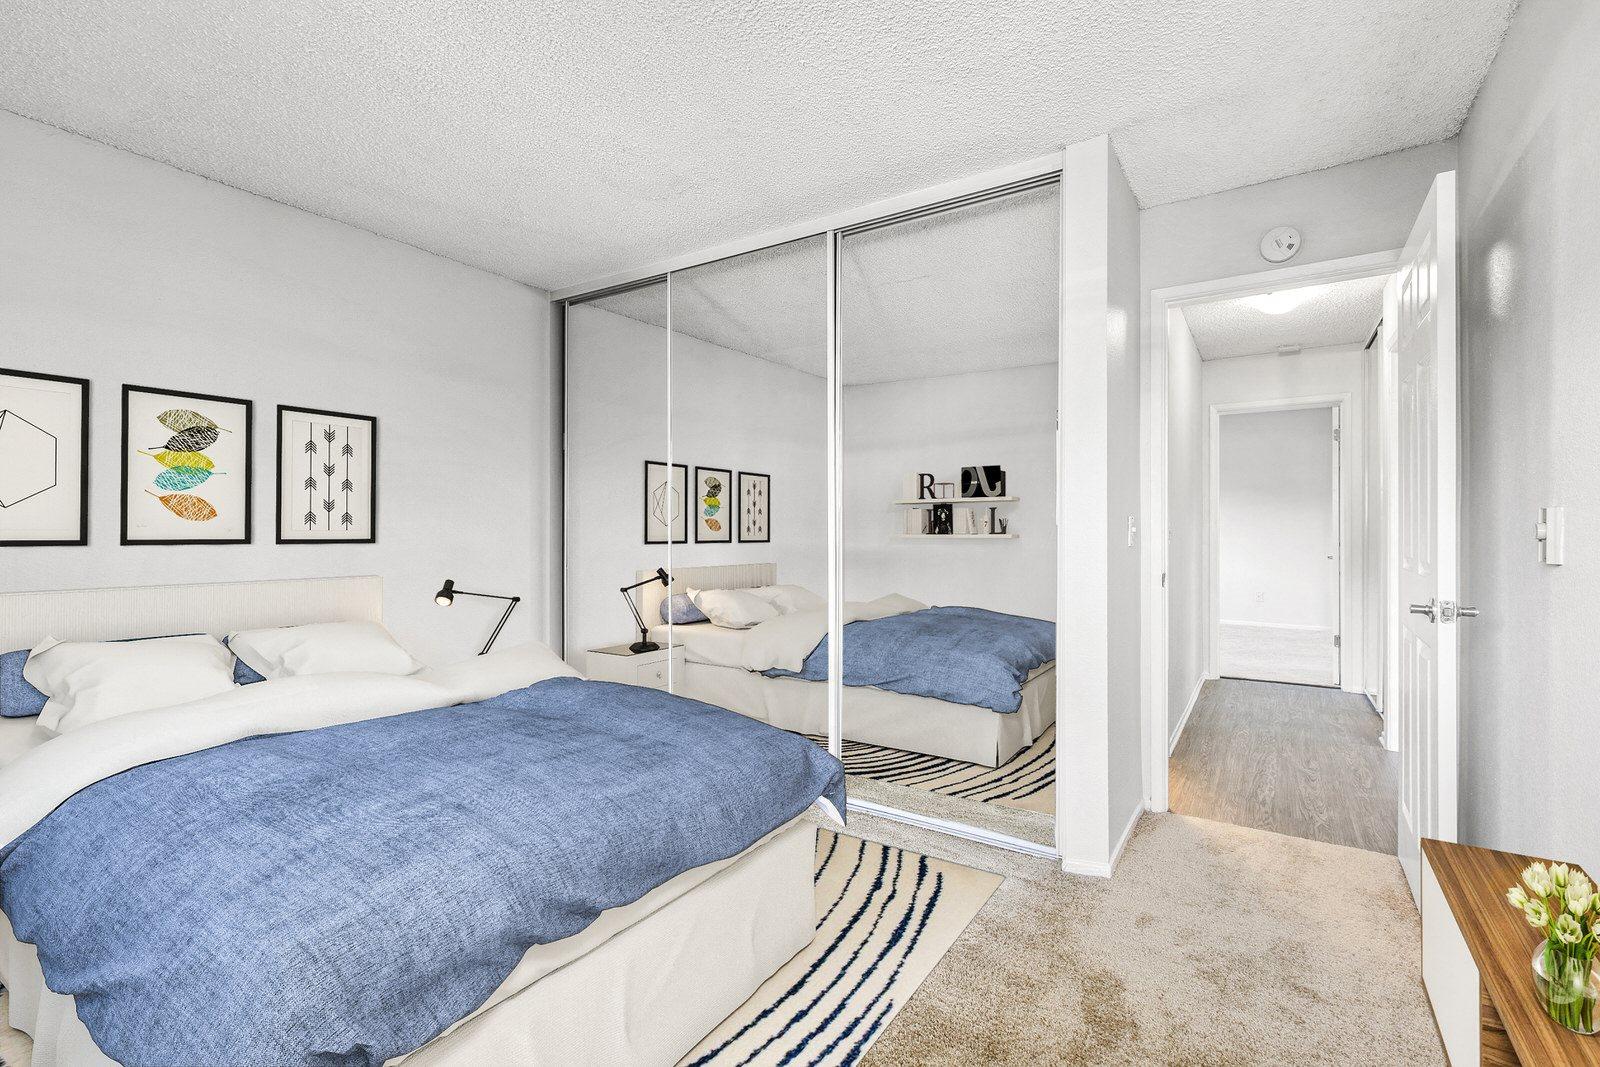 Bedroom Interior Photo at Milano Apartments 20900 Anza Ave Torrance, CA 90503